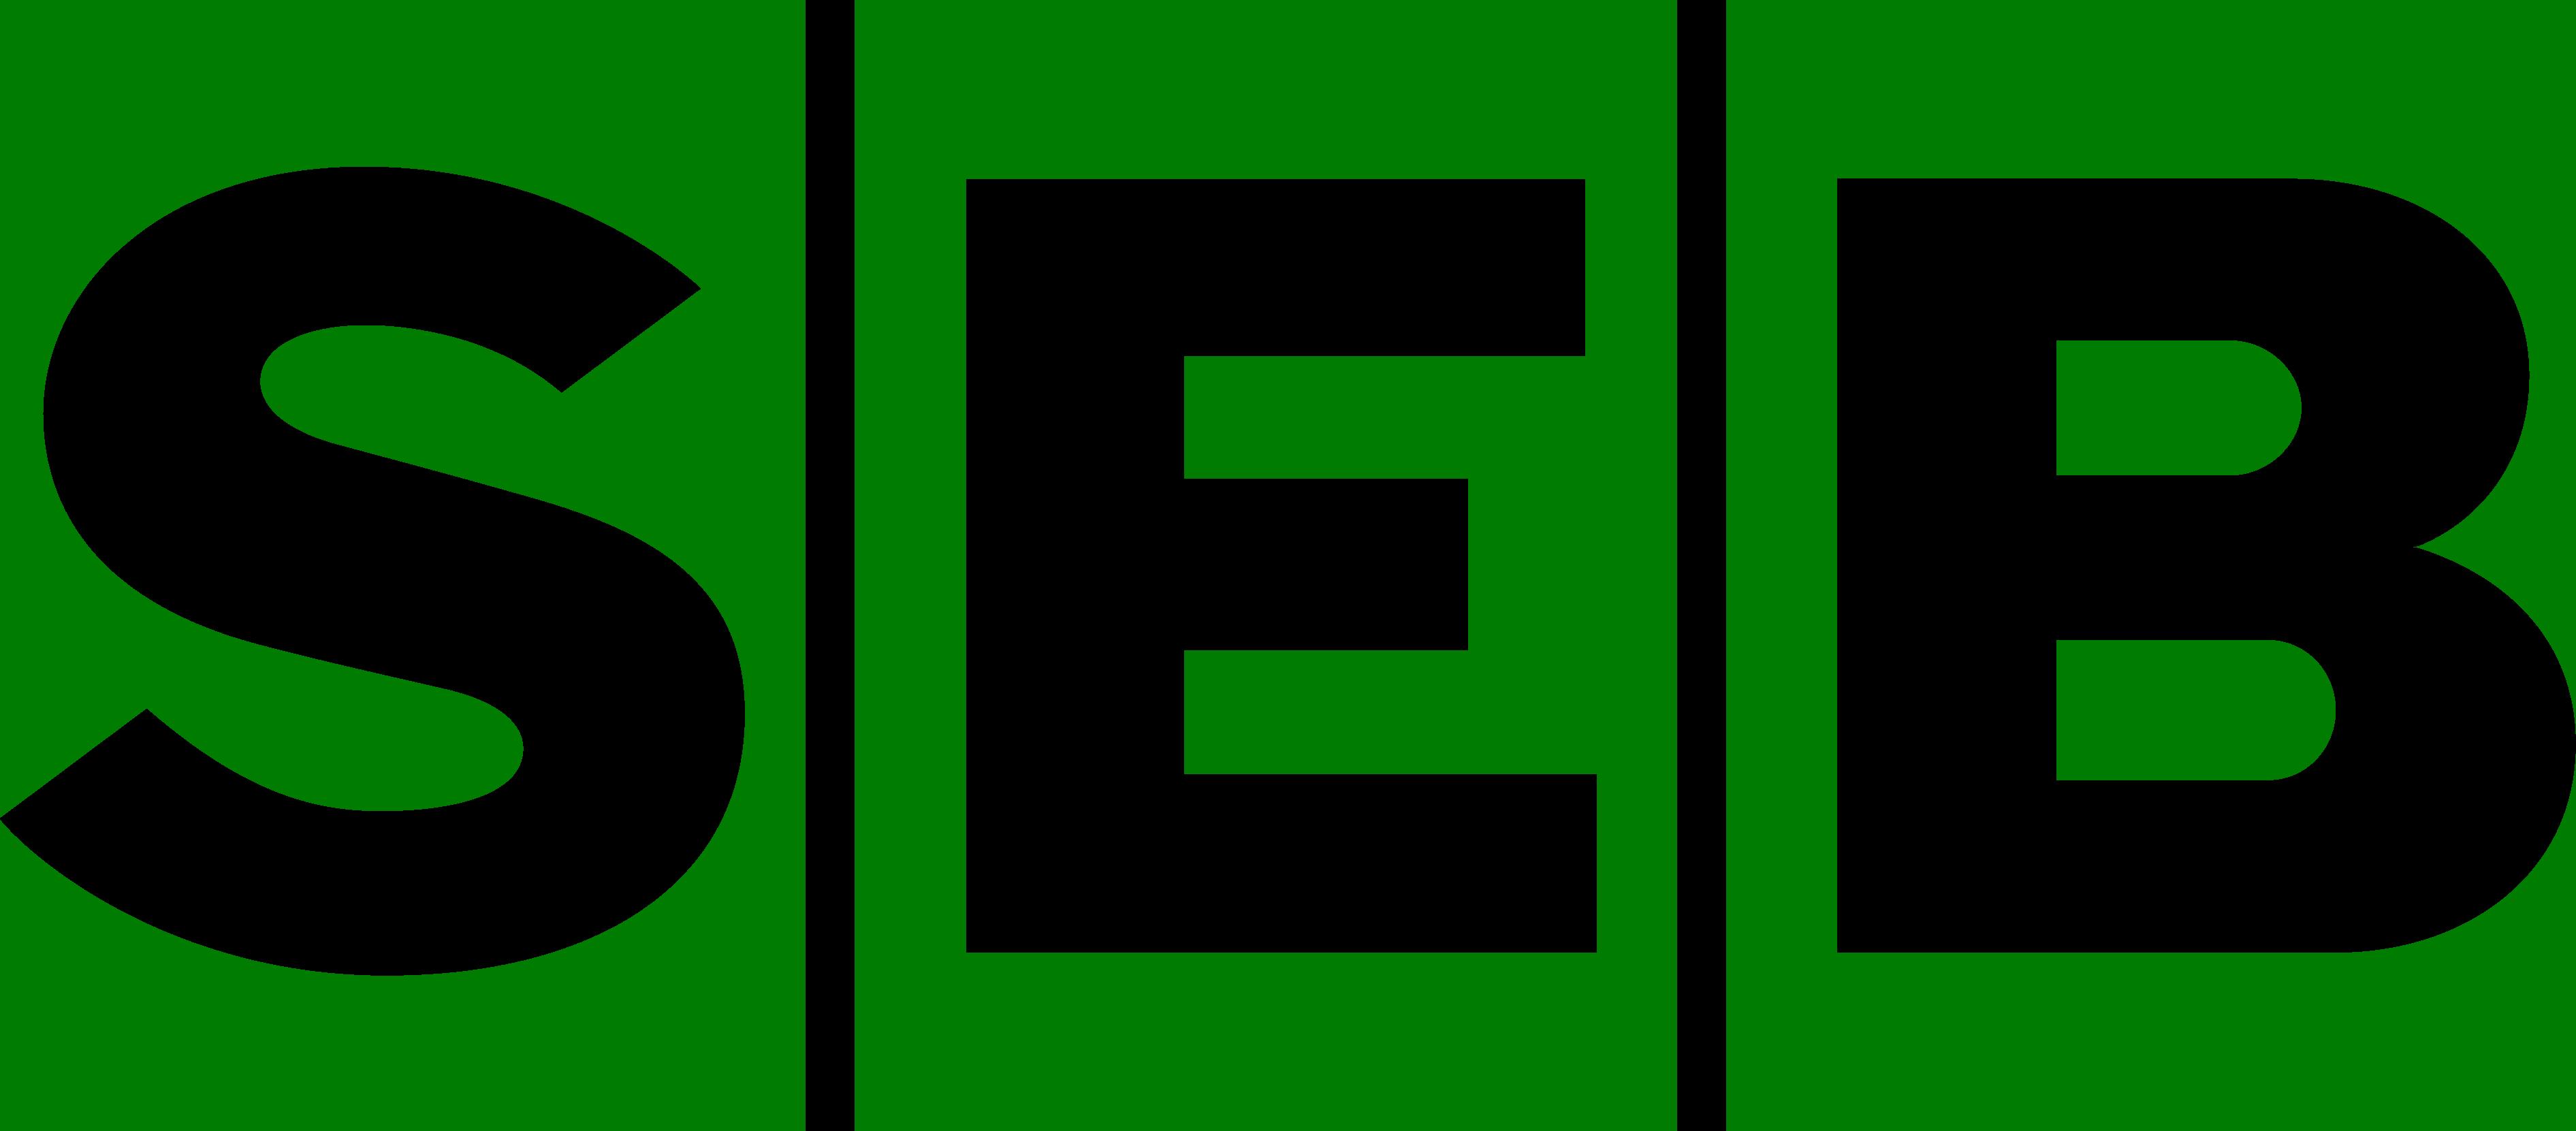 SEB-Wordmark-RGB-Black